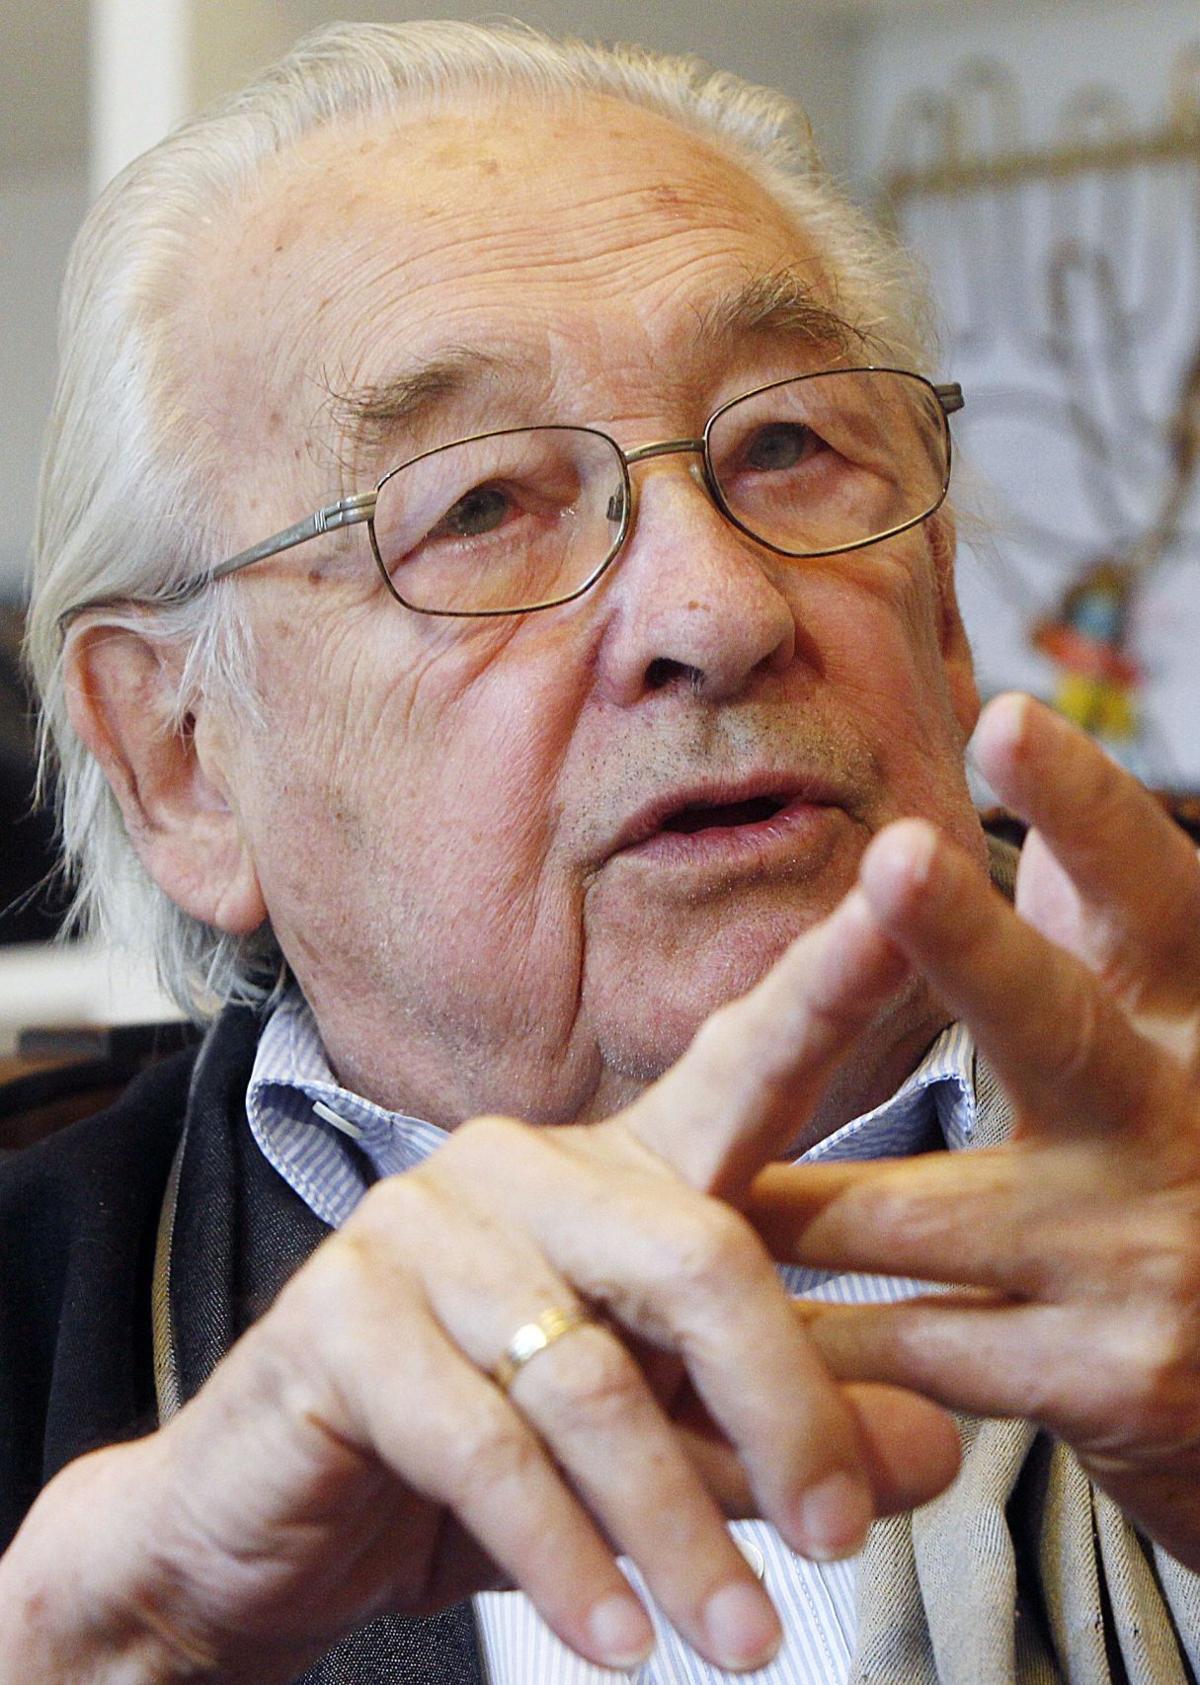 New Polish movie honors Lech Walesa